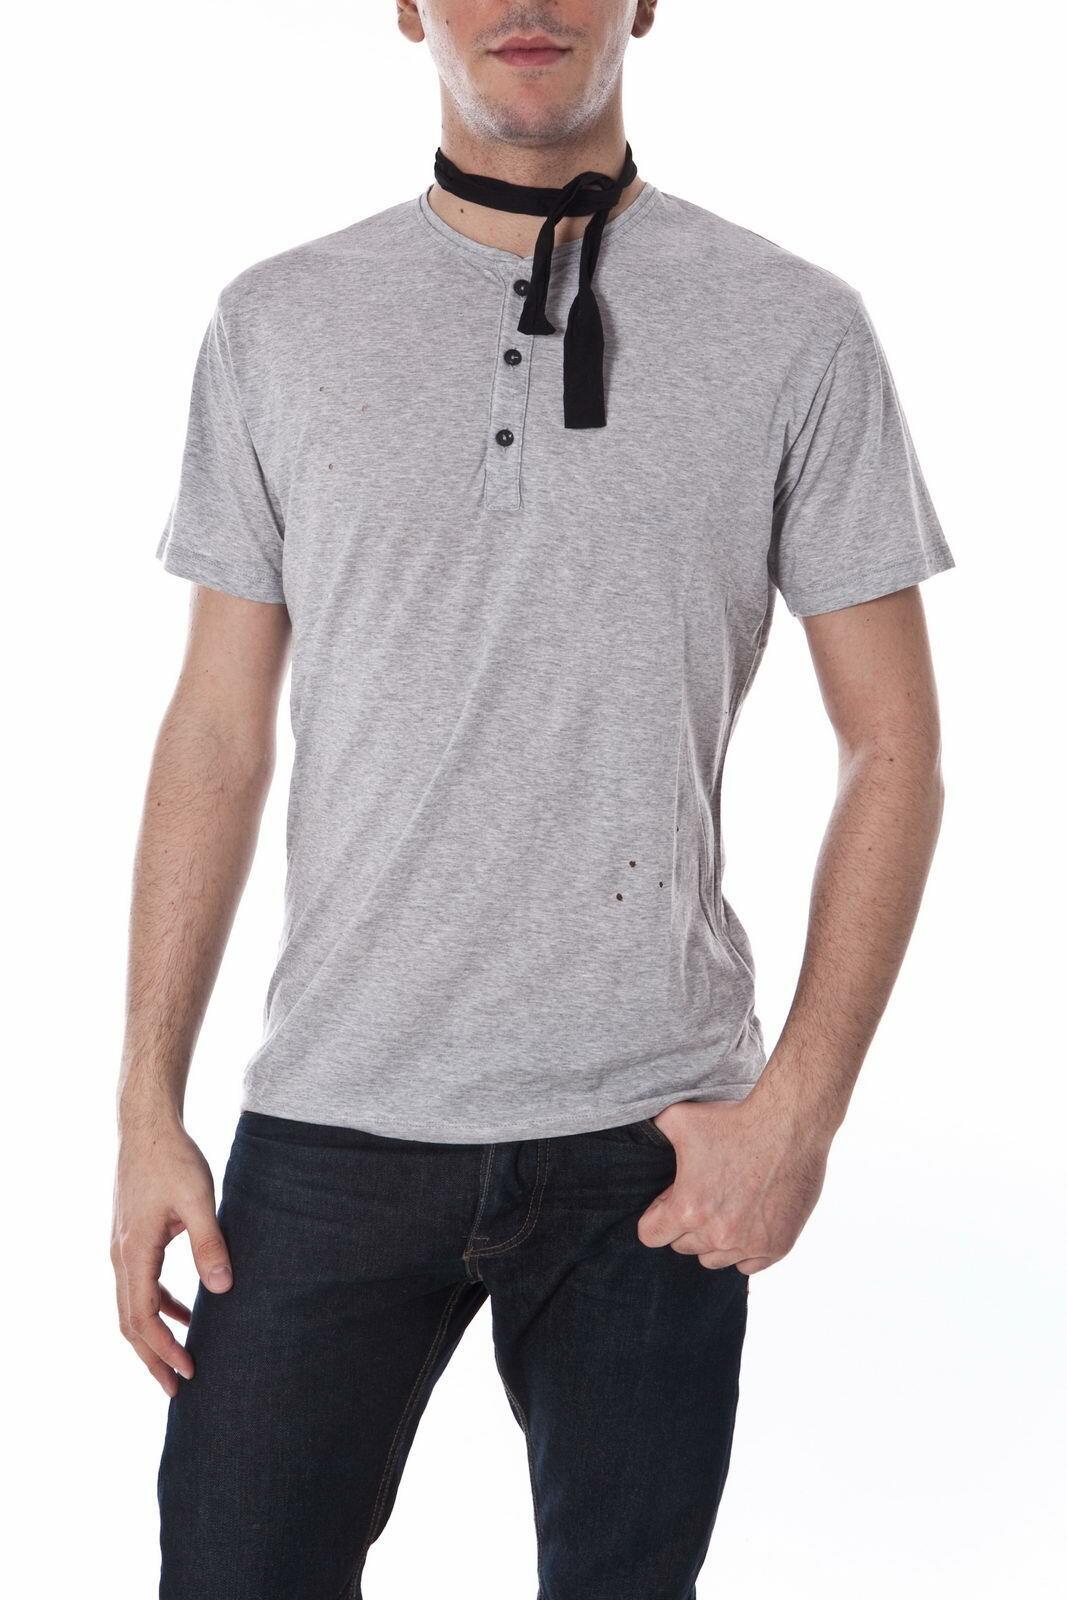 Daniele Alessandrini Tank Top T shirt Herren Grau M4597E5033302 11 Gr. L ANGEBOT